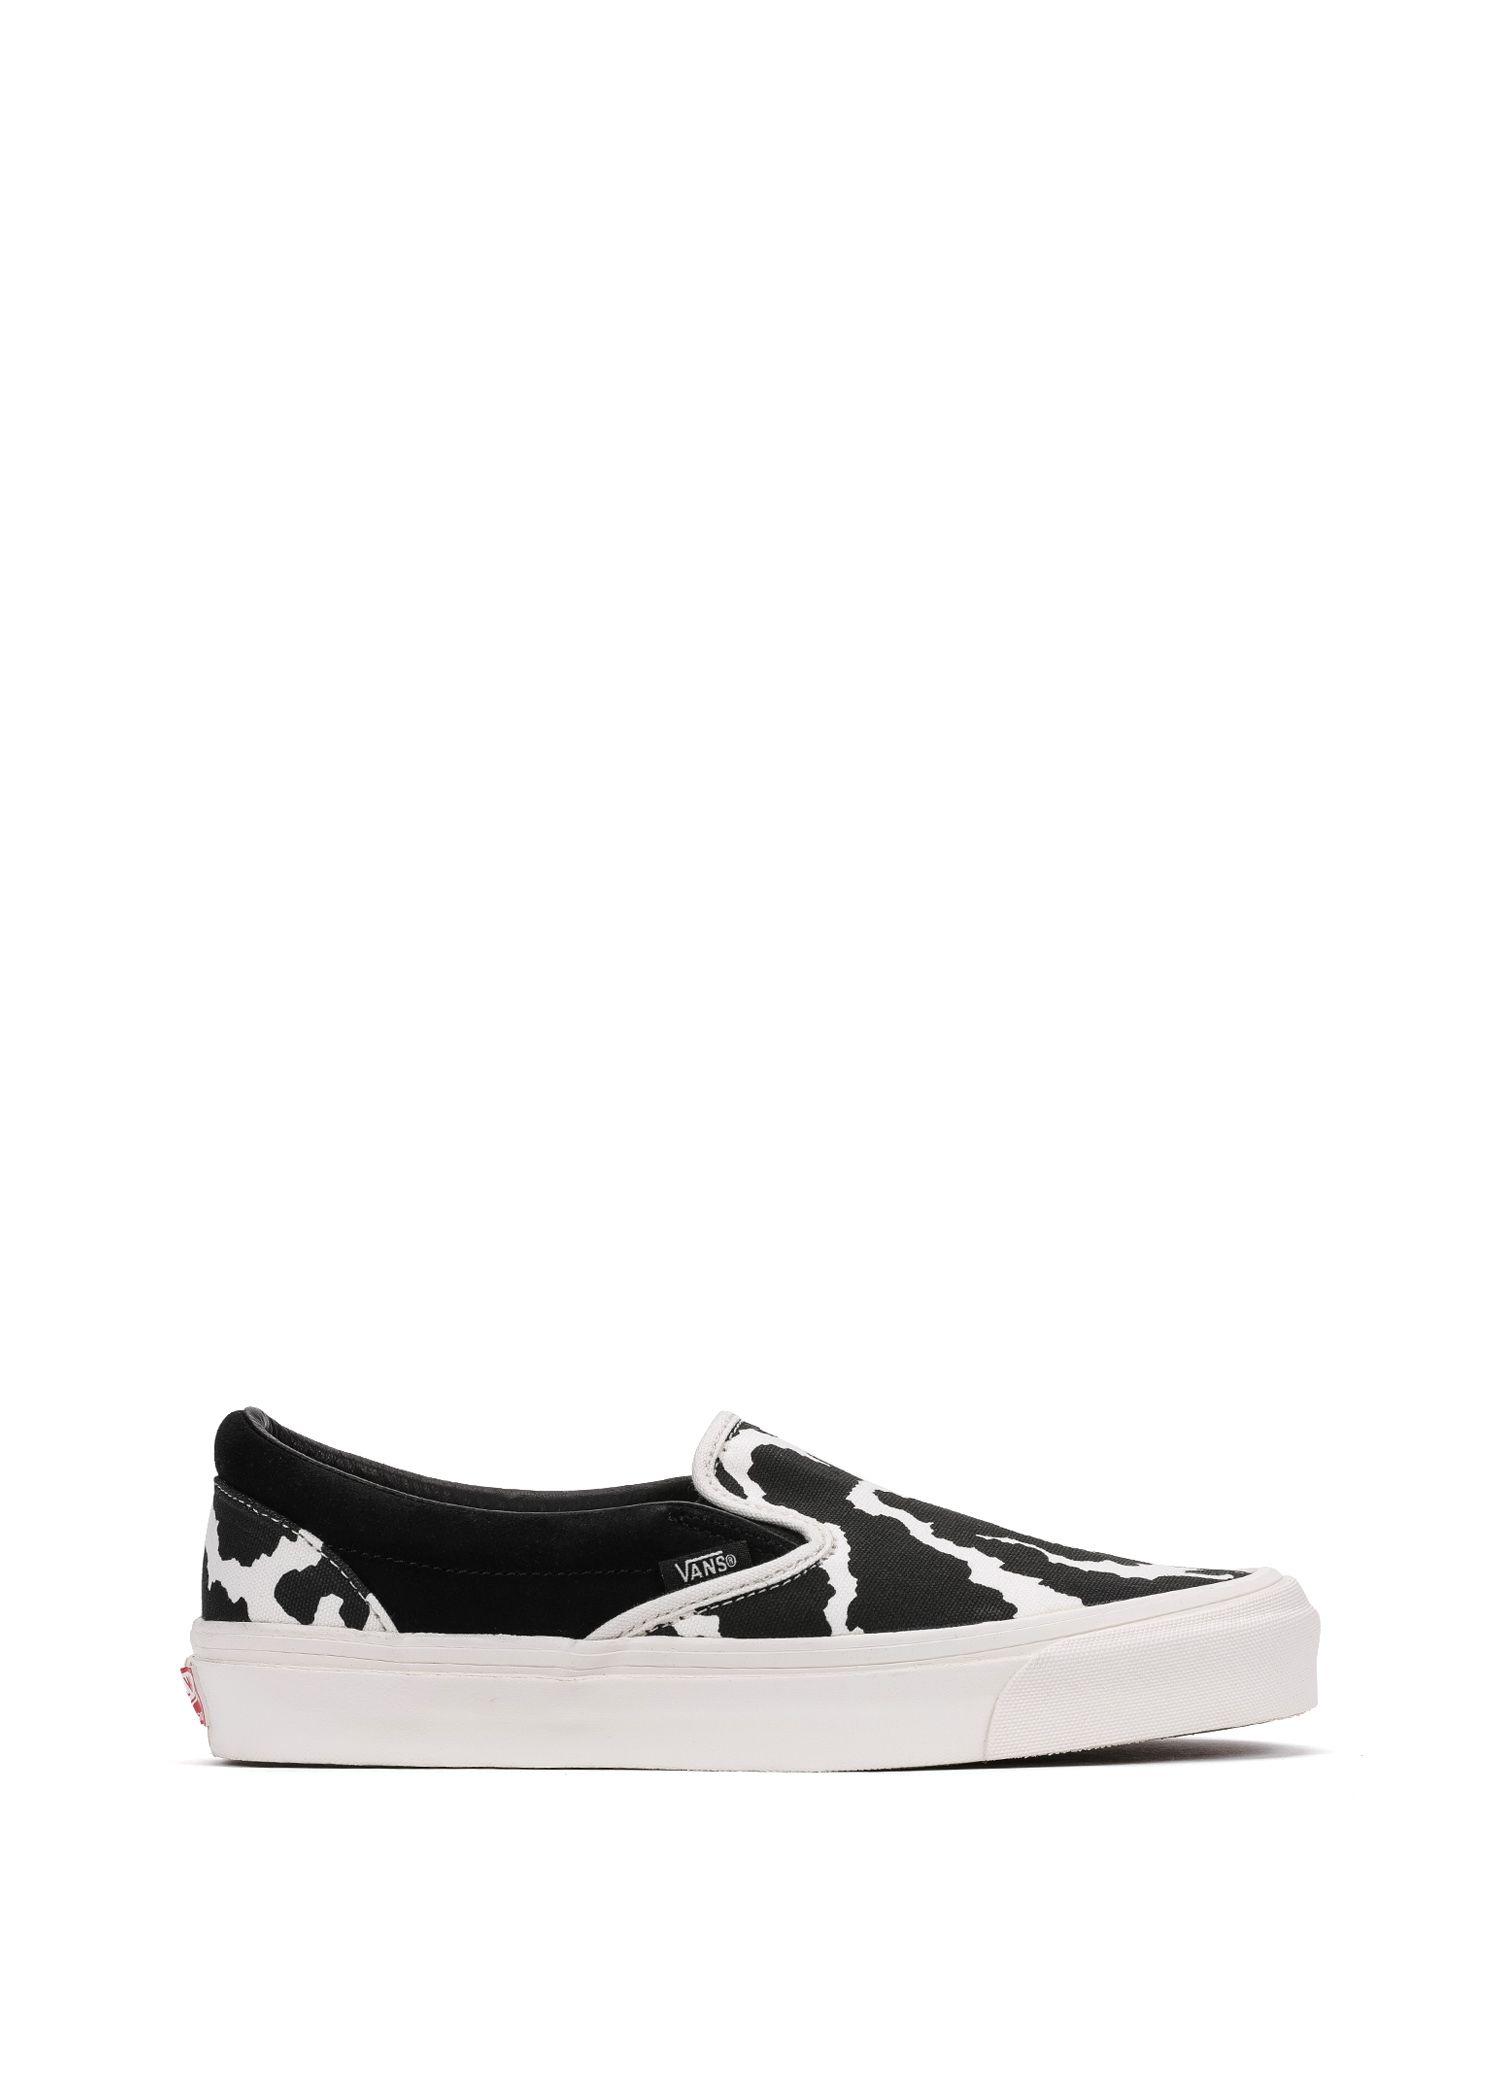 a241128c18f4 VANS OG CLASSIC SLIP-ON LX.  vans  shoes   Black Cow